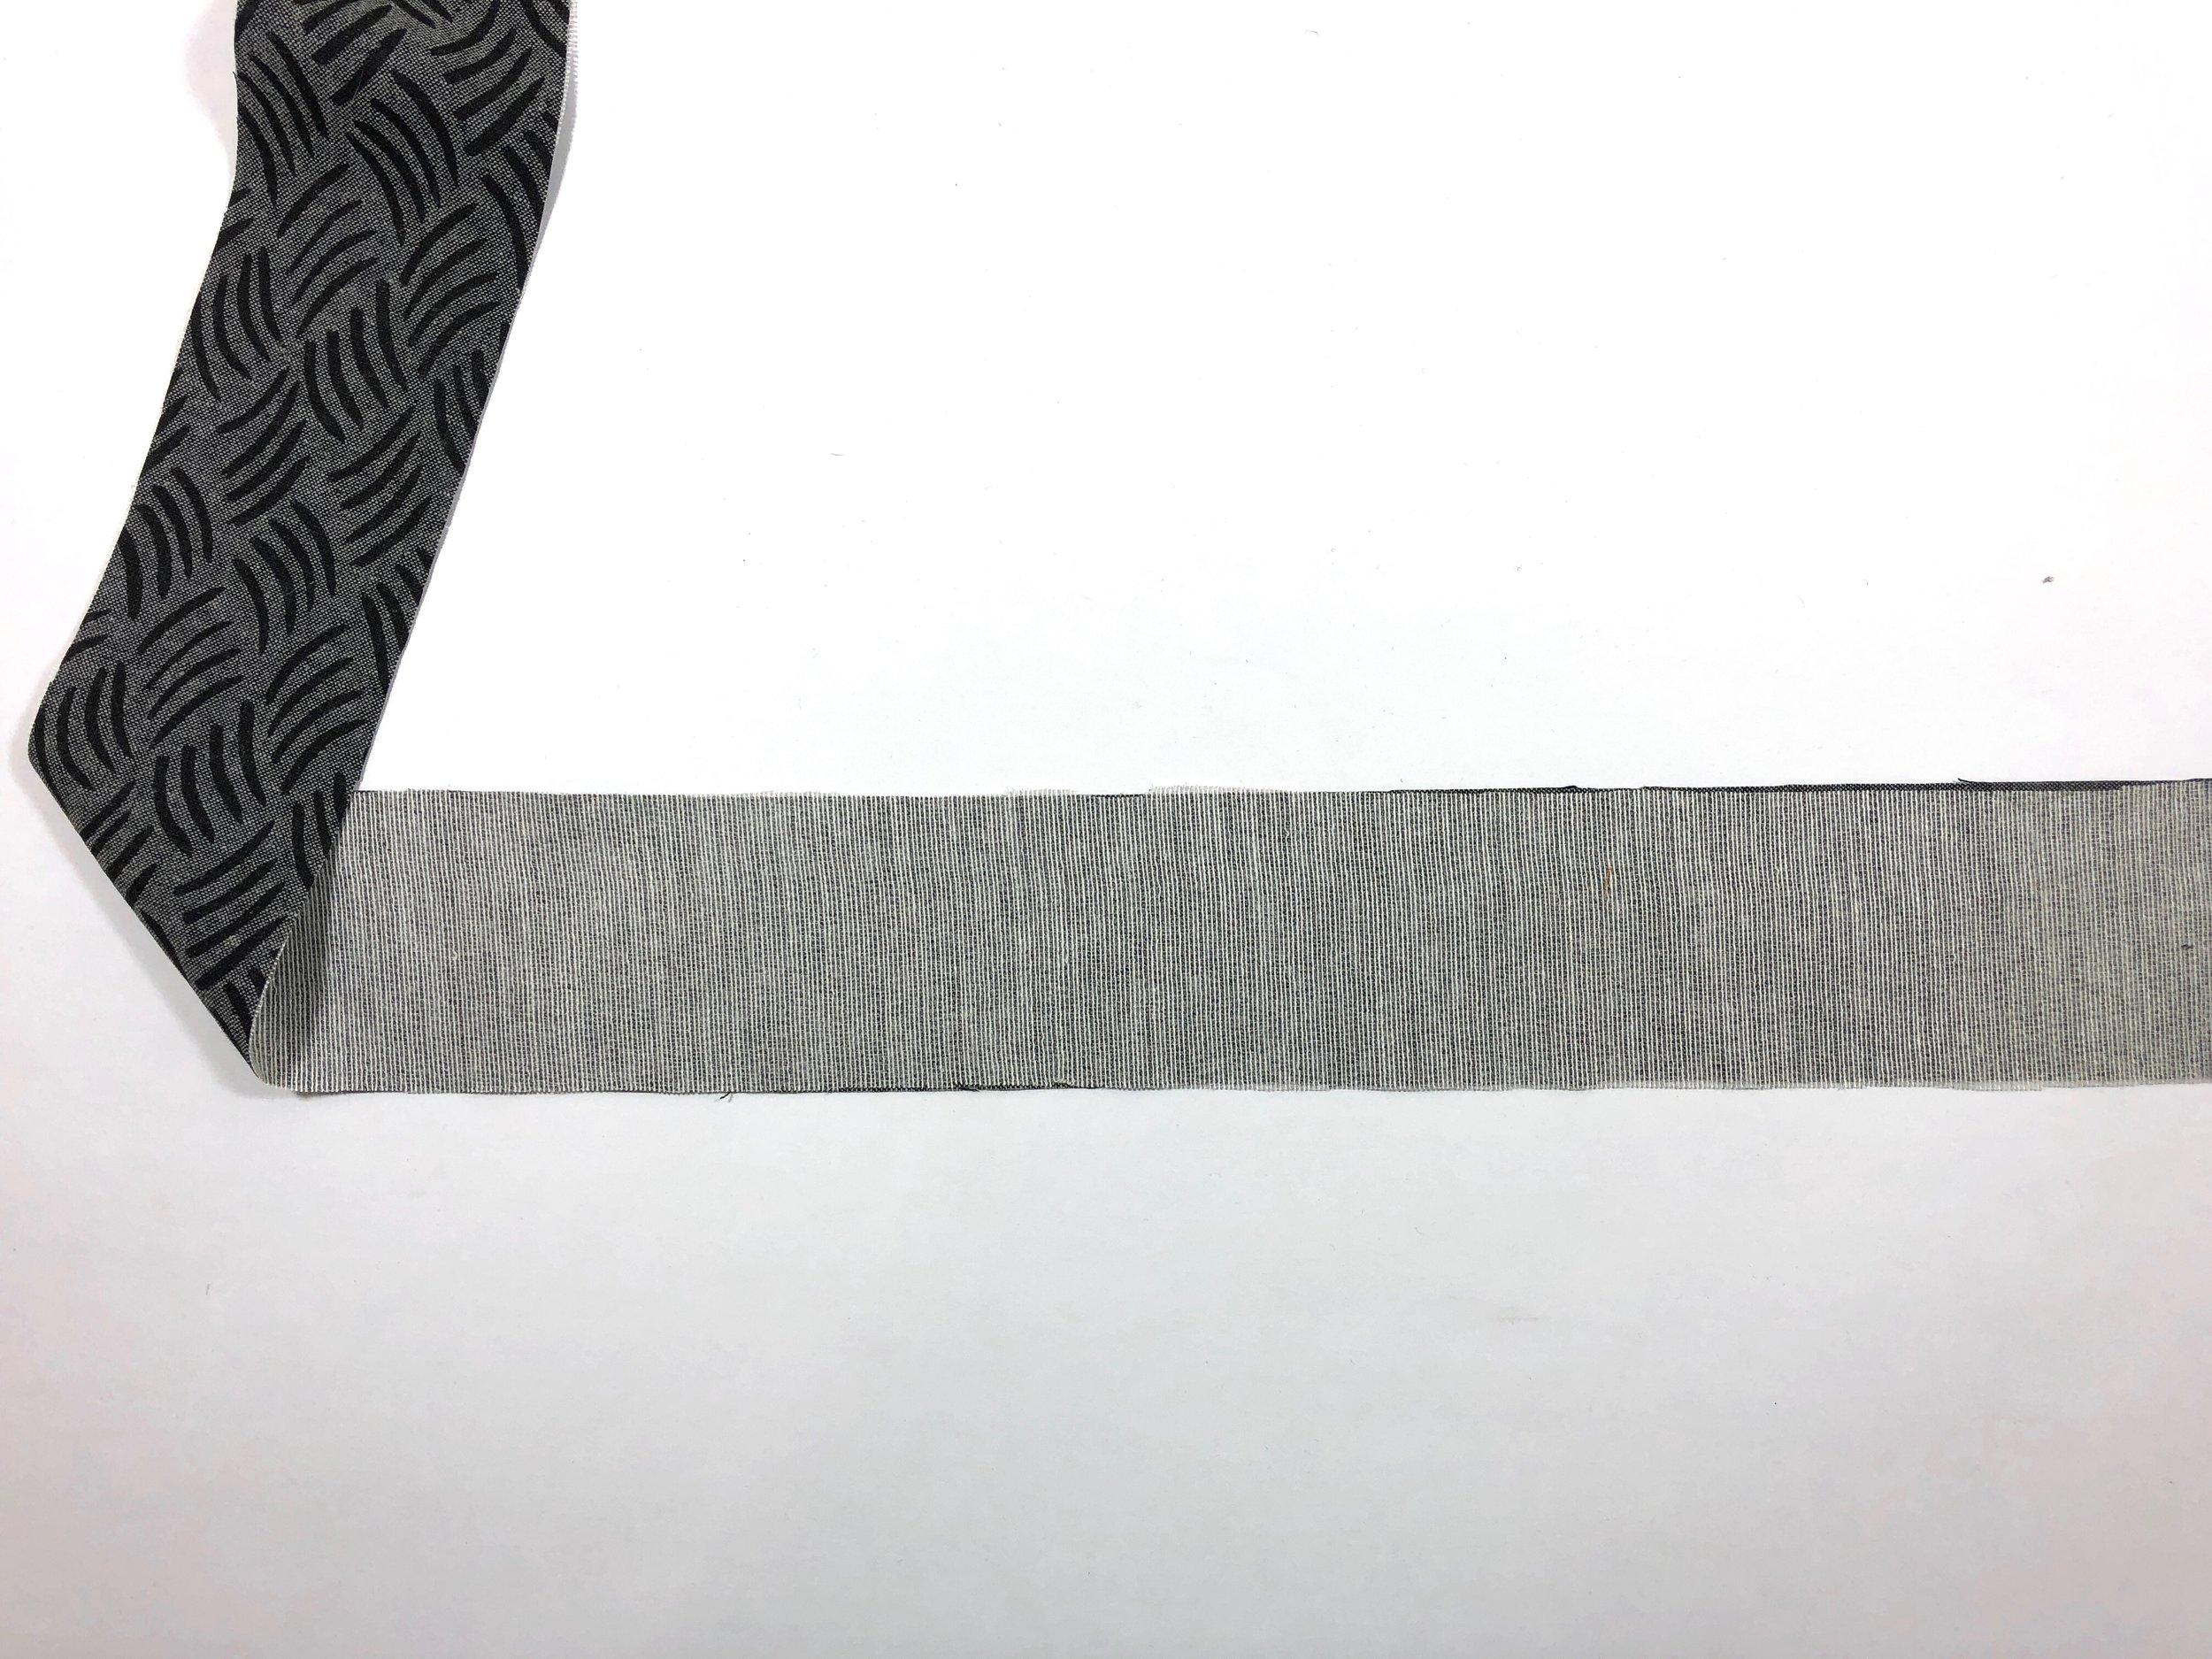 1. Interface waistband.